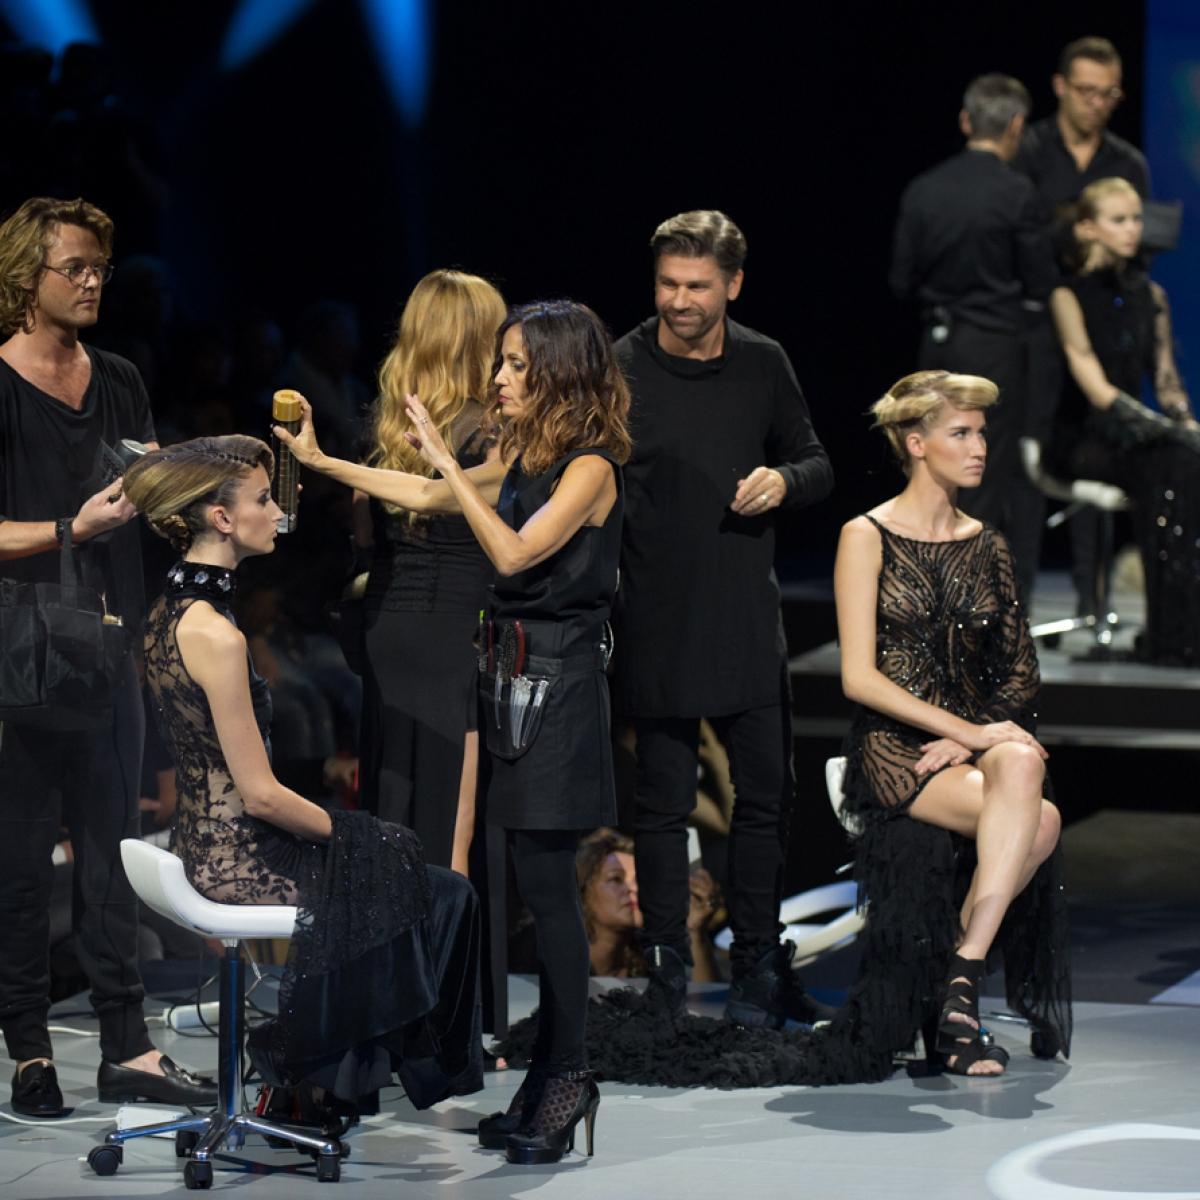 haute coiffure francaise 2016-385